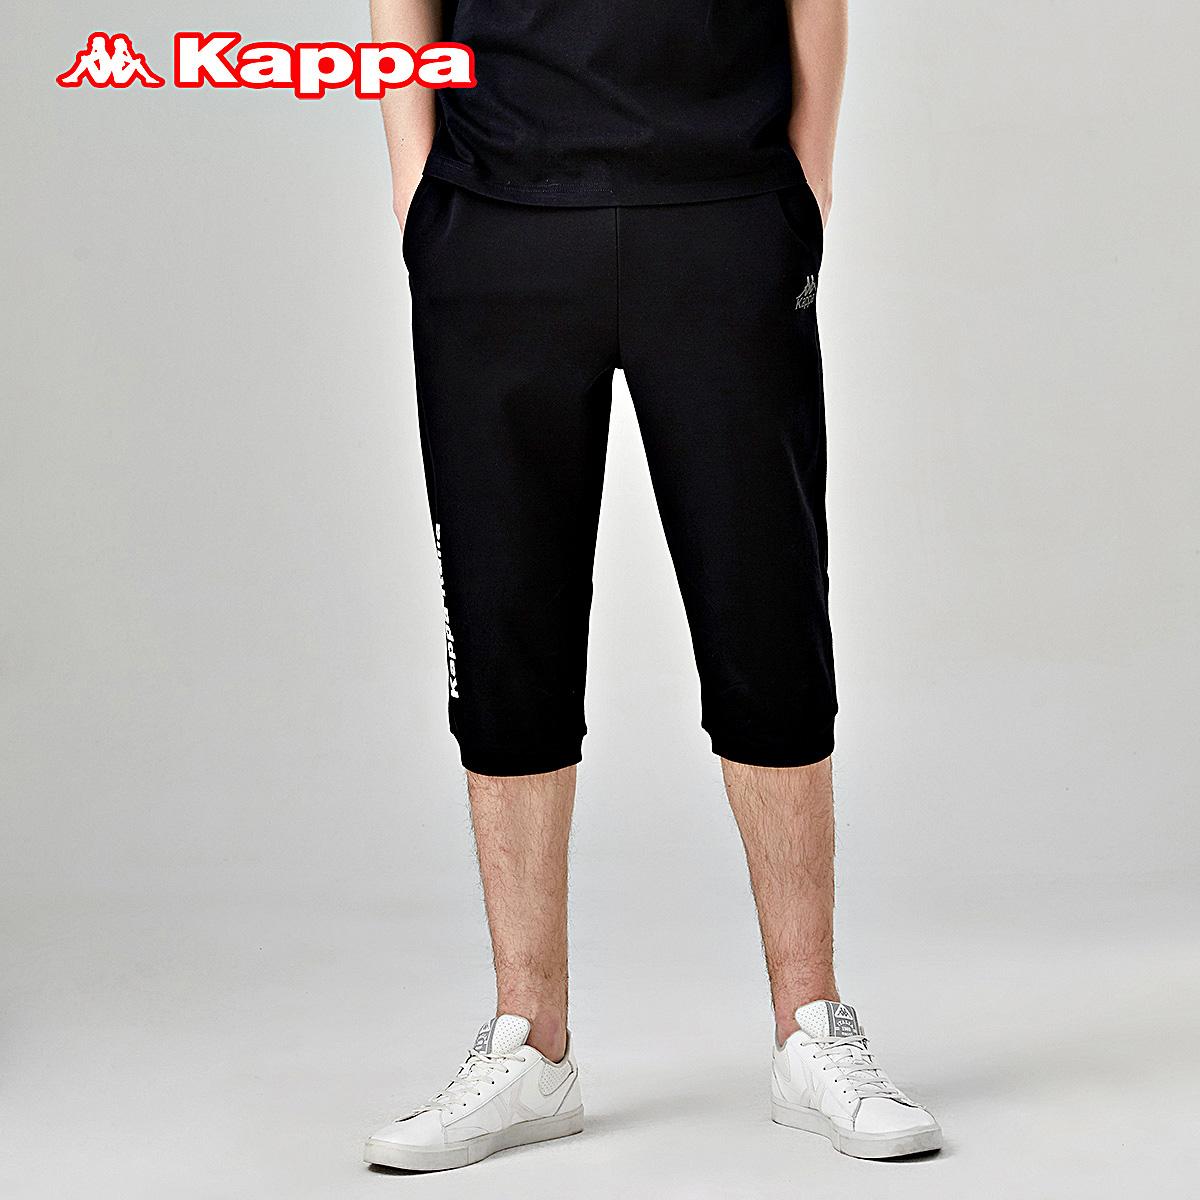 kappa男款运动七分裤2019休闲裤(非品牌)